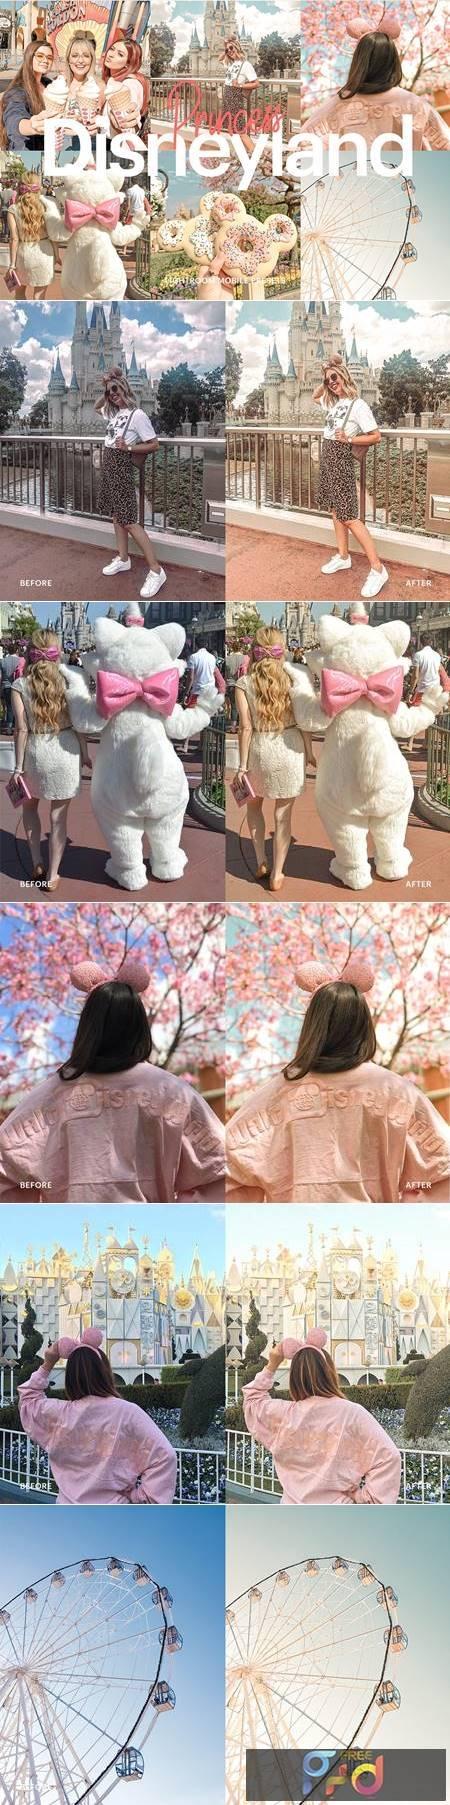 Lightroom Preset - Disneyland Princess 4973030 1